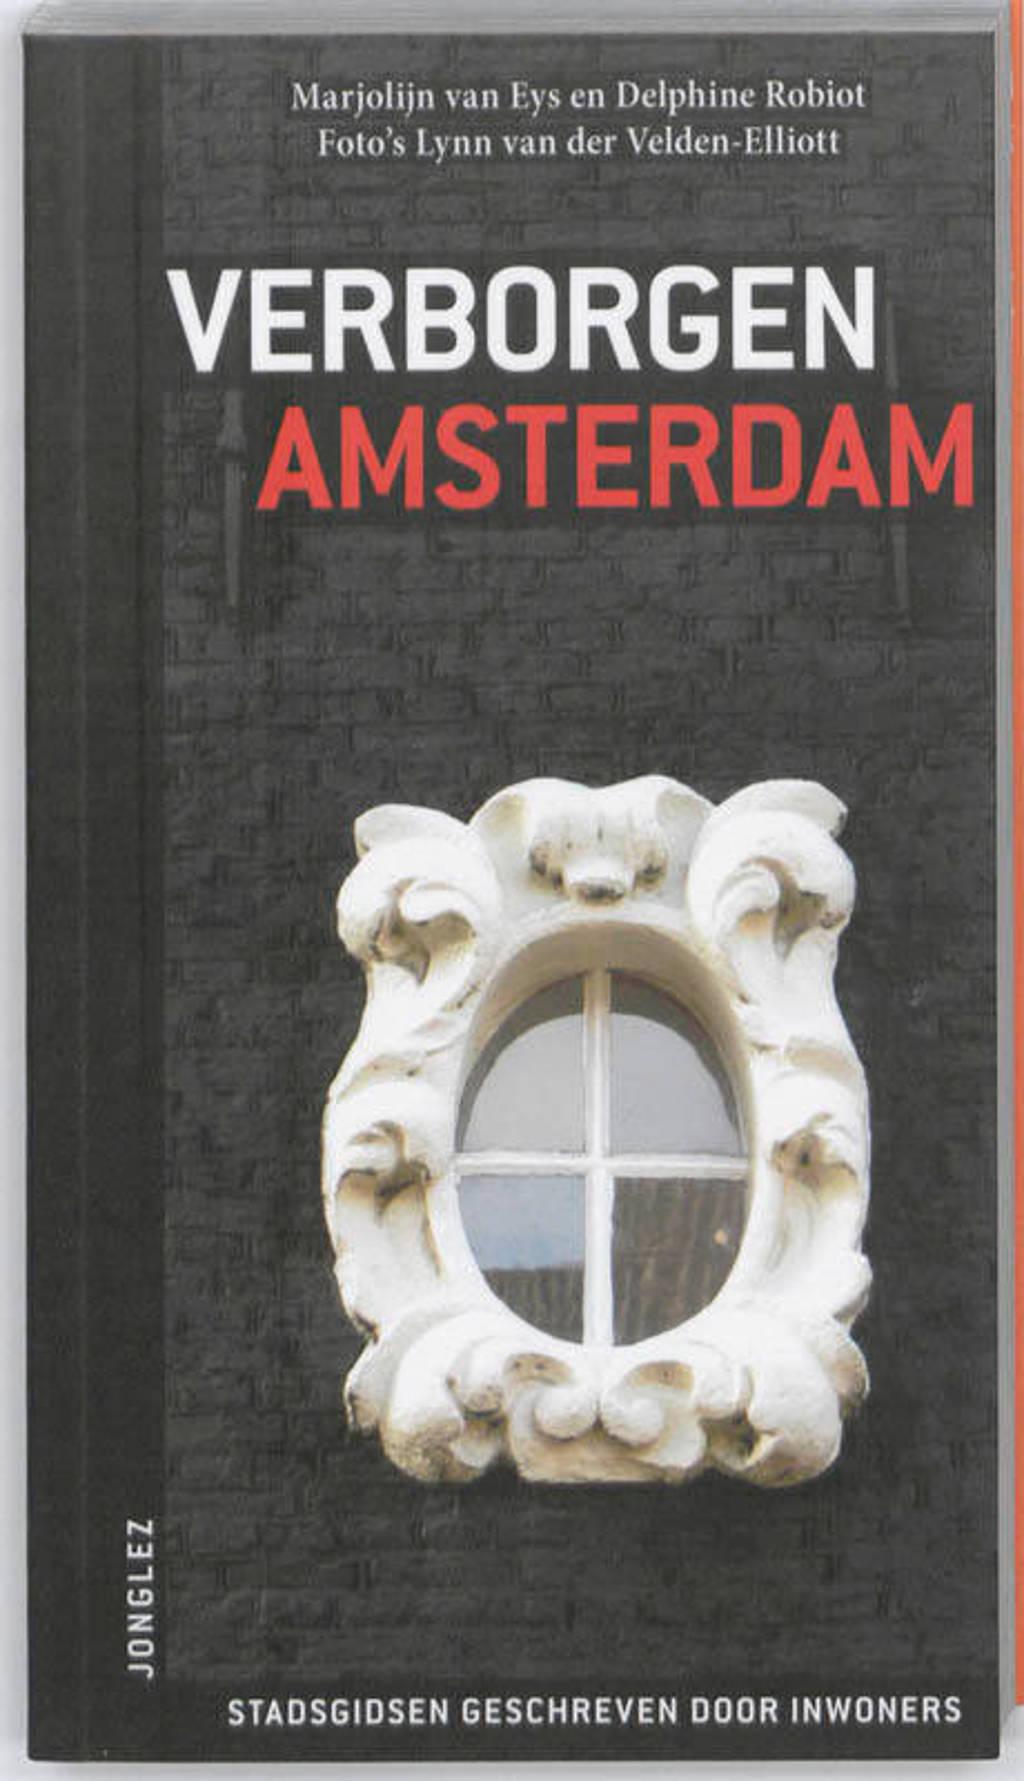 Michelin Editions Jonglez: Verborgen Amsterdam - Marjolein van Eys